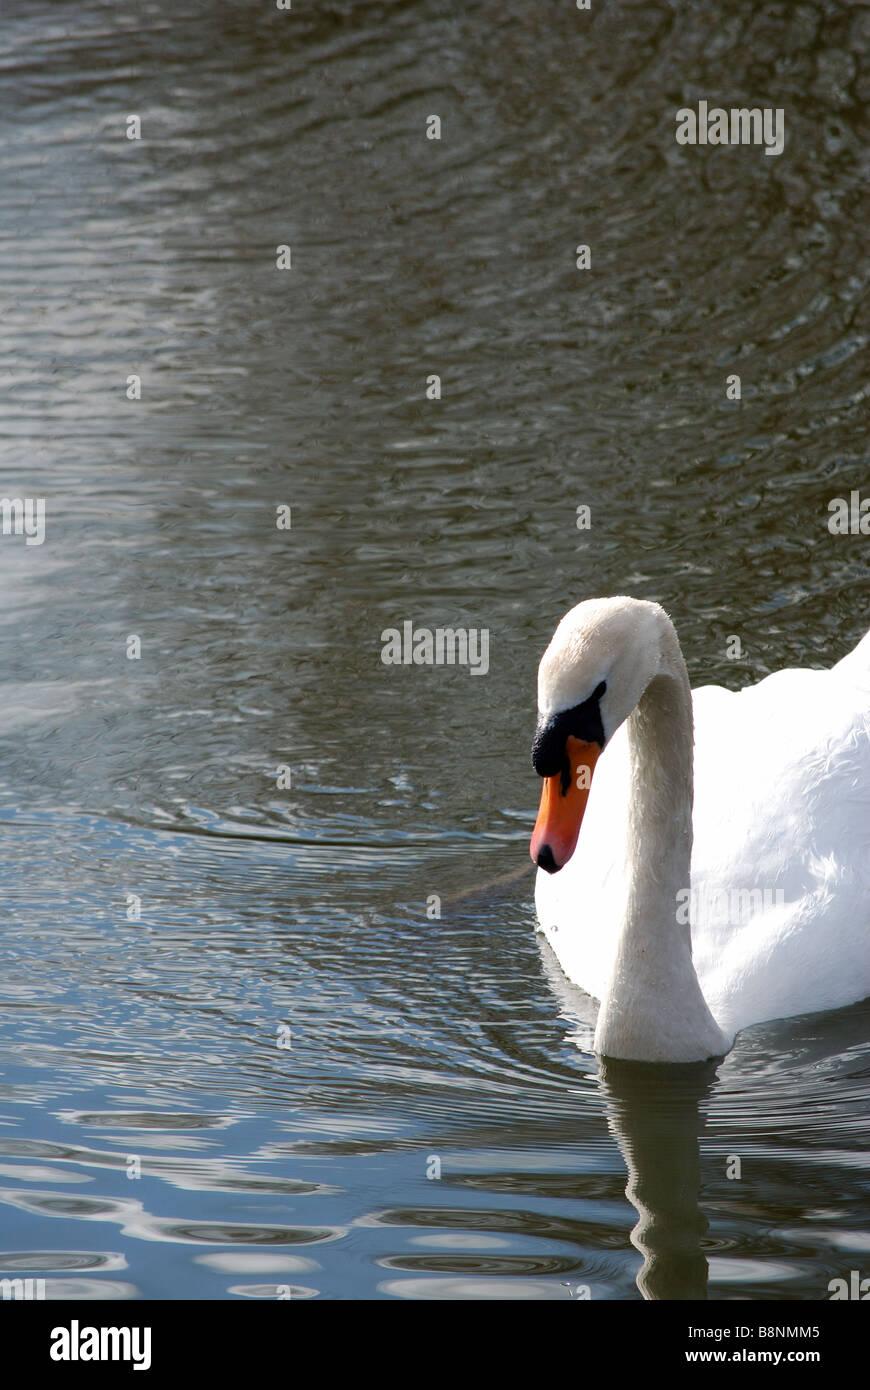 Swan swimming towards camera - Stock Image